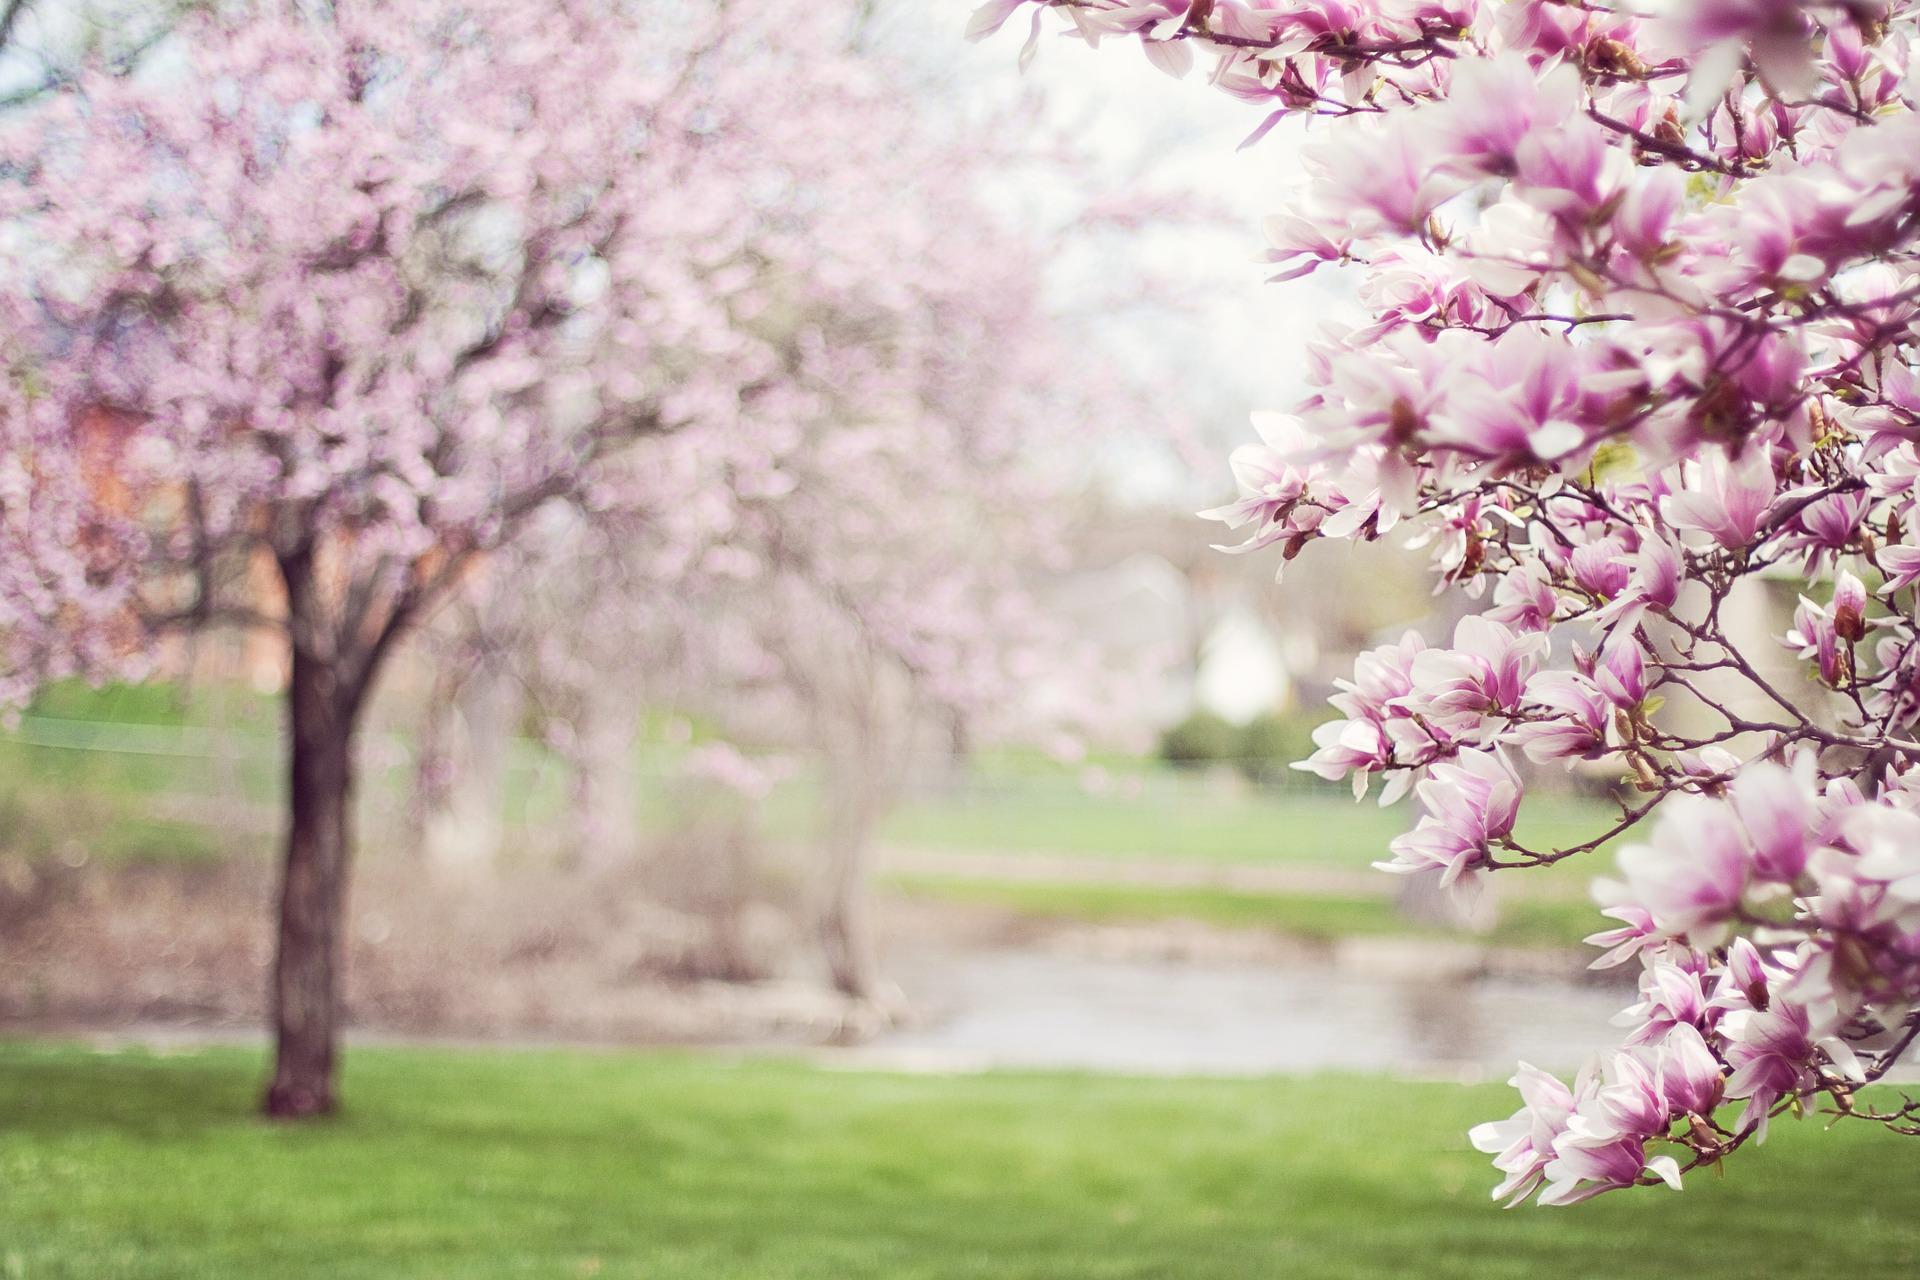 magnolia-trees-556718_1920 (1)